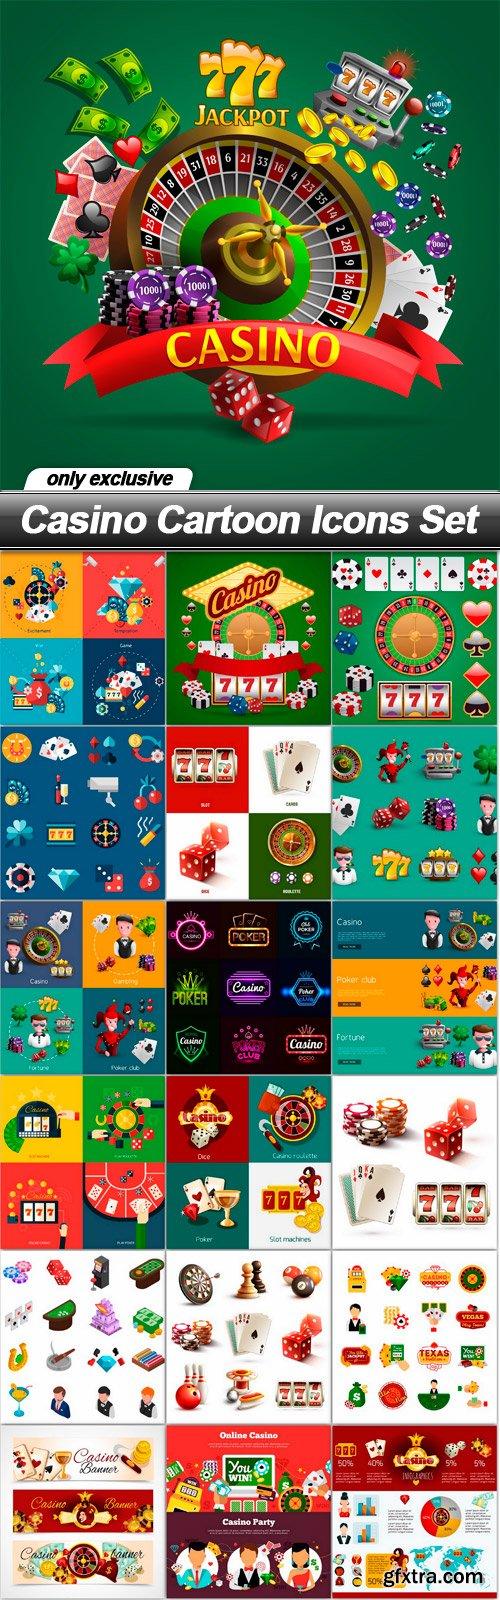 Casino Cartoon Icons Set - 19 EPS